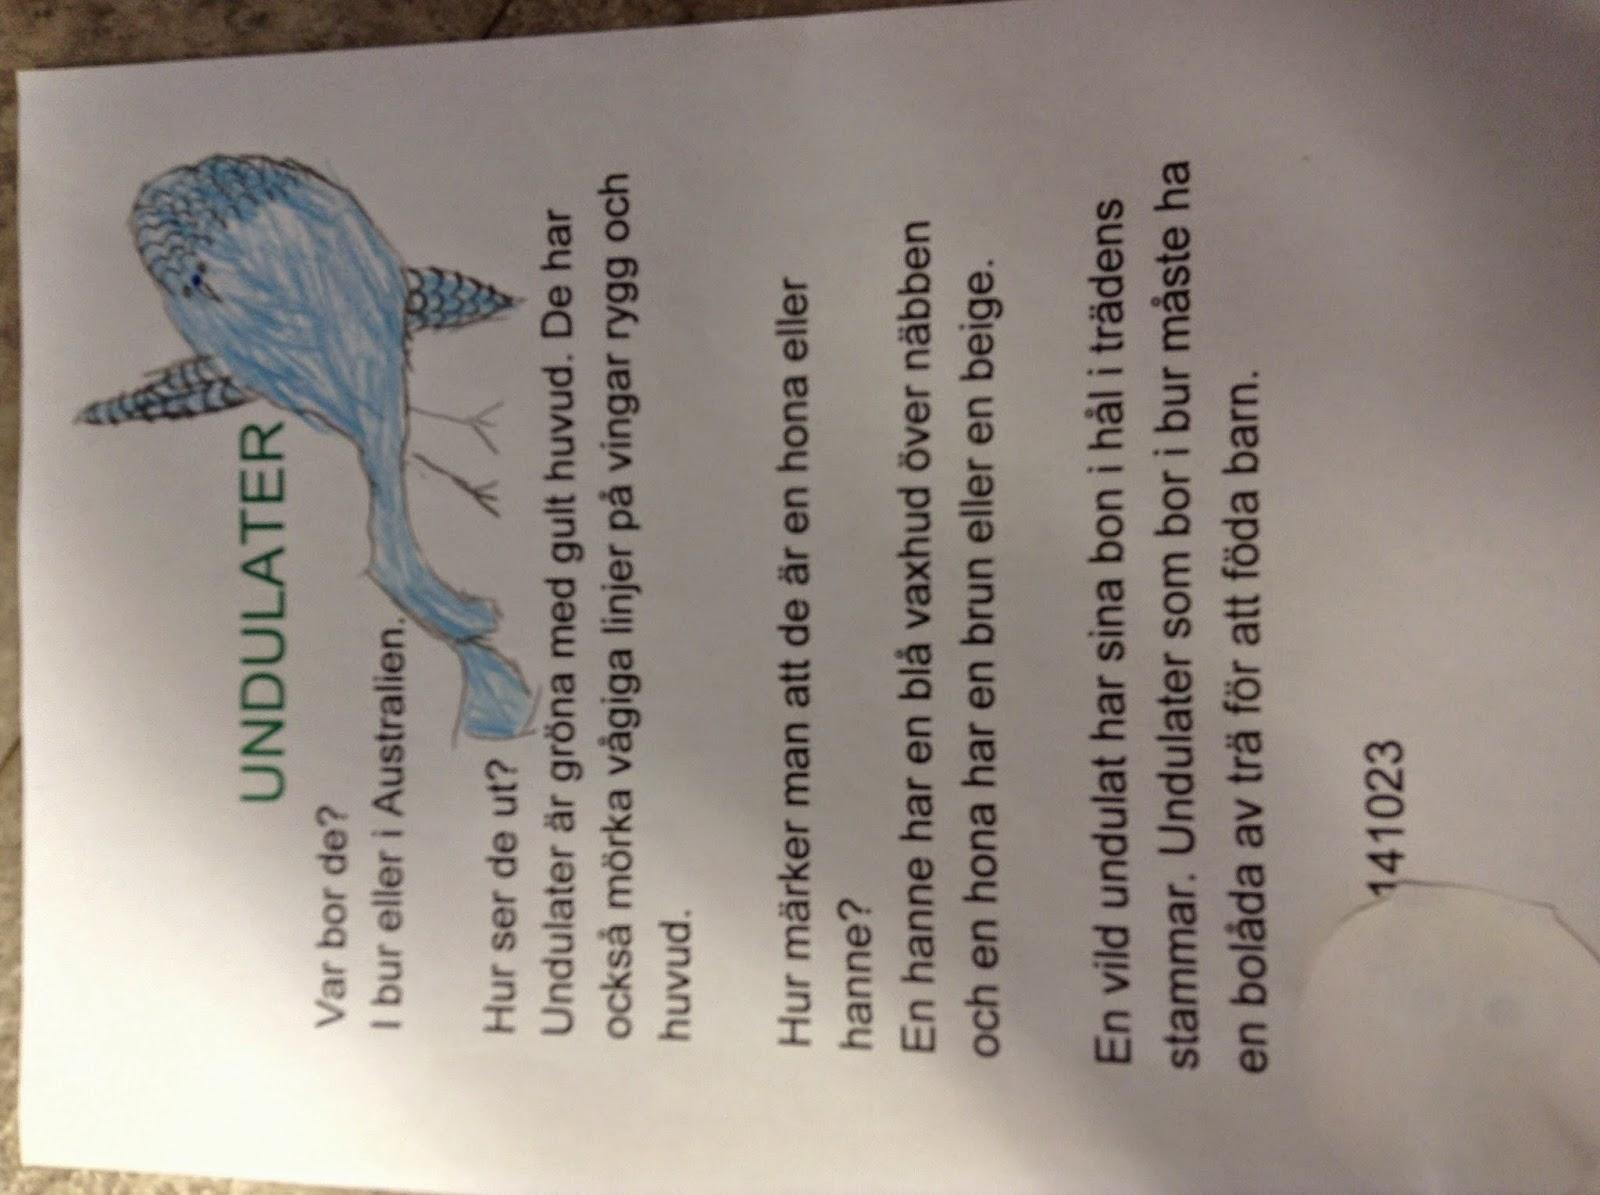 faktatext om djur